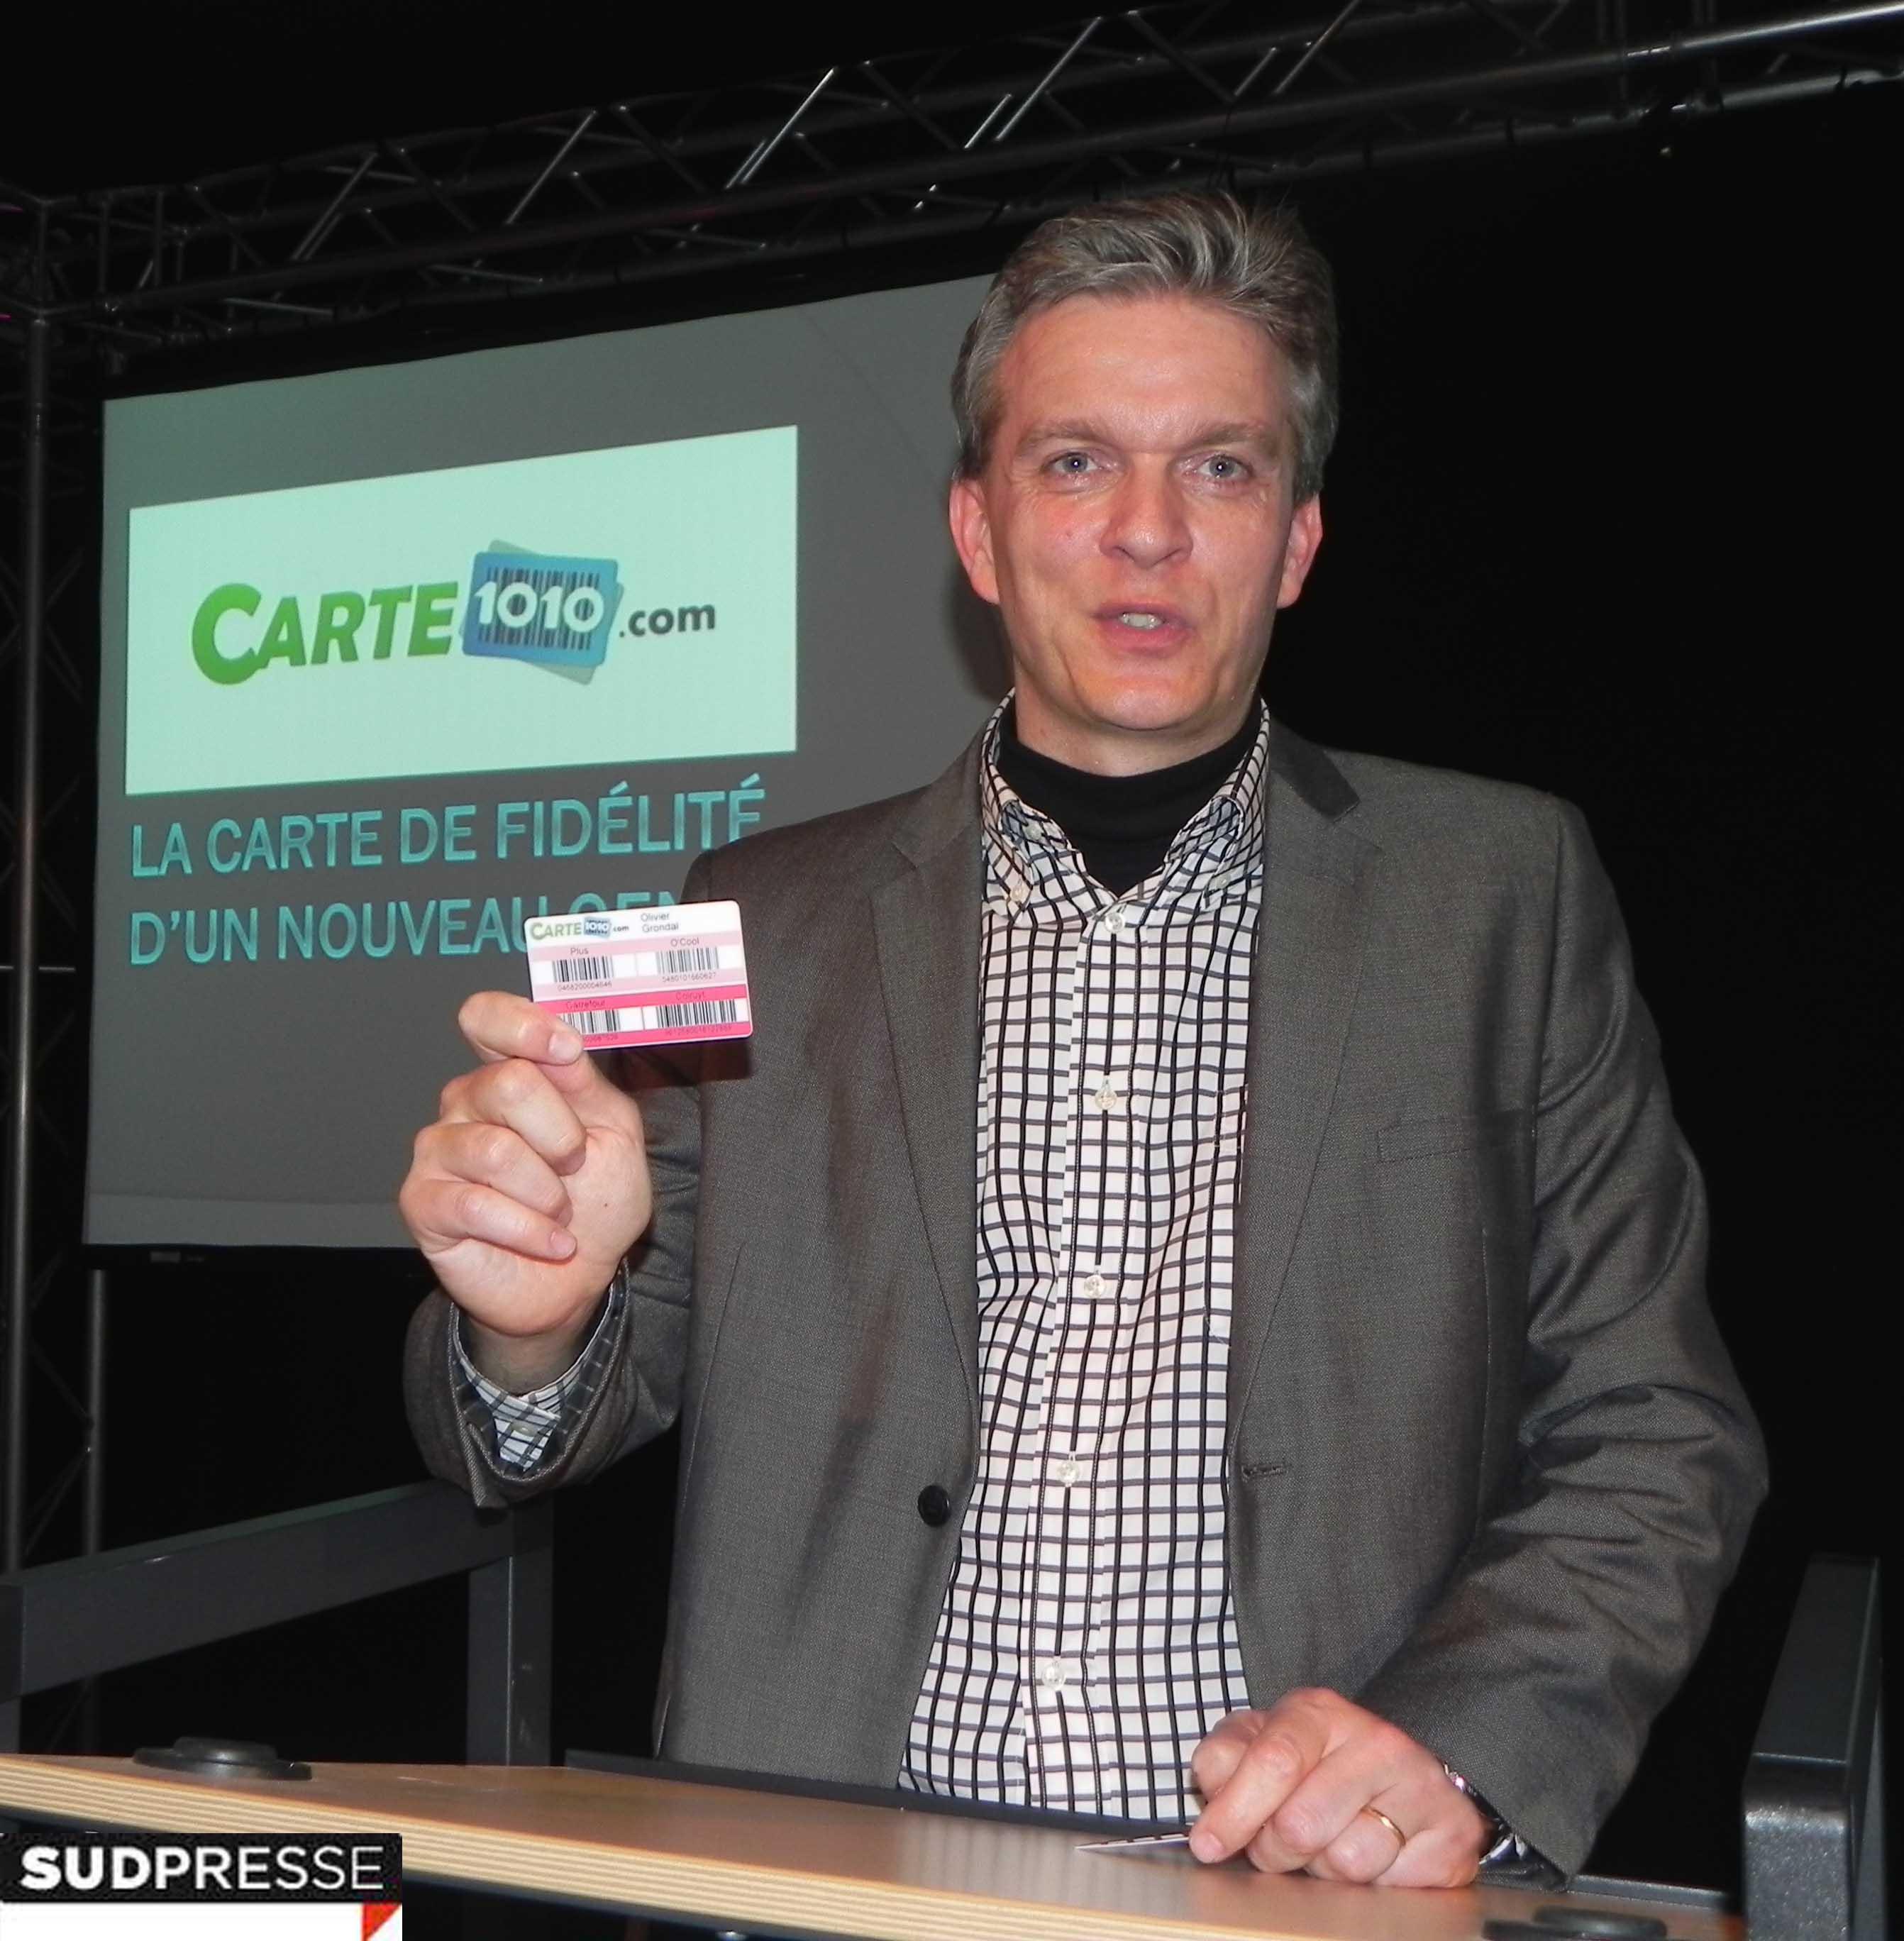 Carte 1o1o com la presse parle de la carte de fid lit for Salon entreprendre